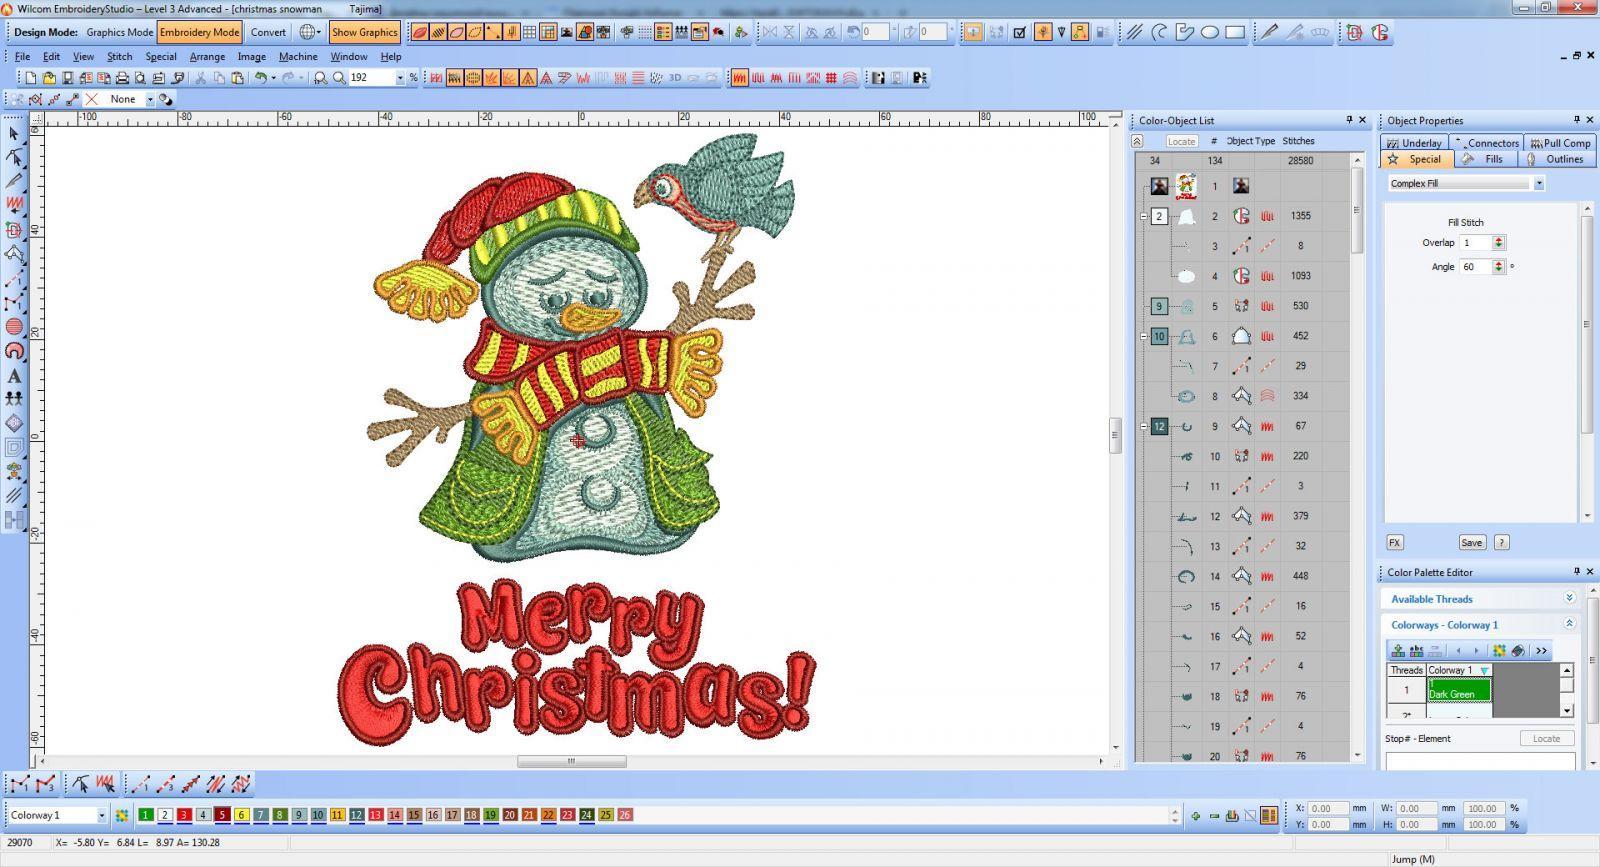 Christmas embroidery design screen shot